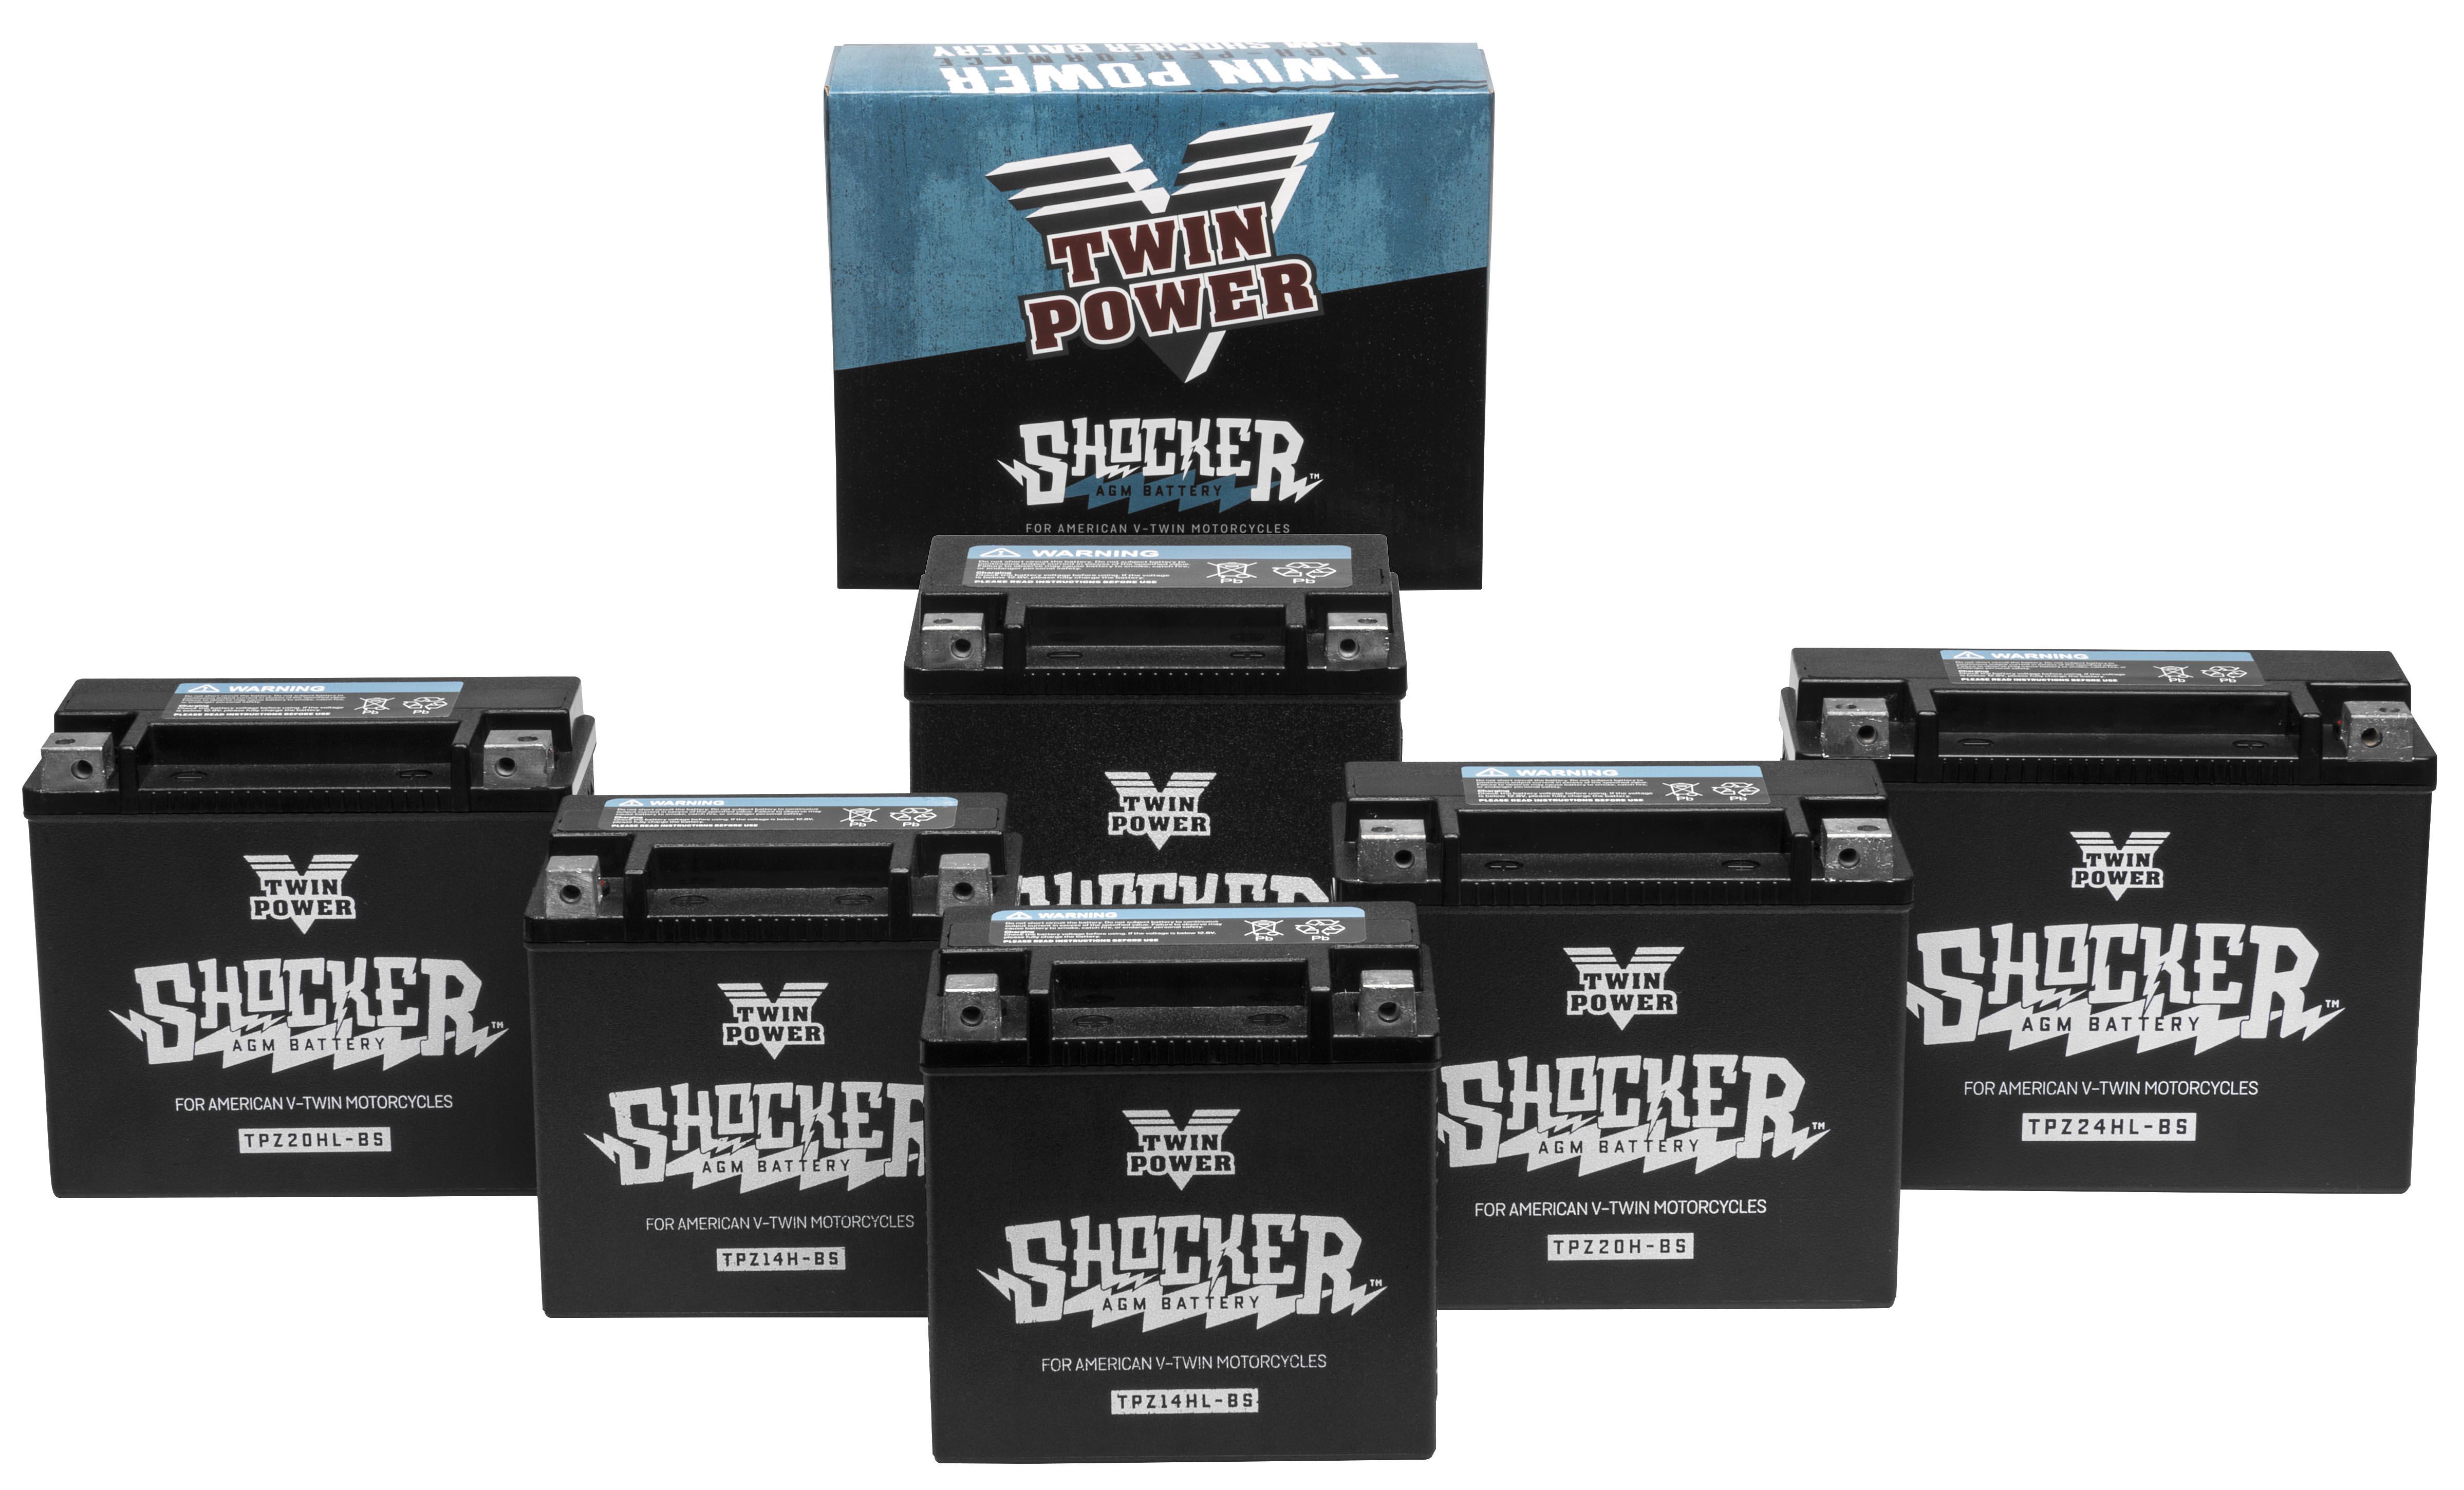 Twin Power Introduces Shocker™ Battery Line